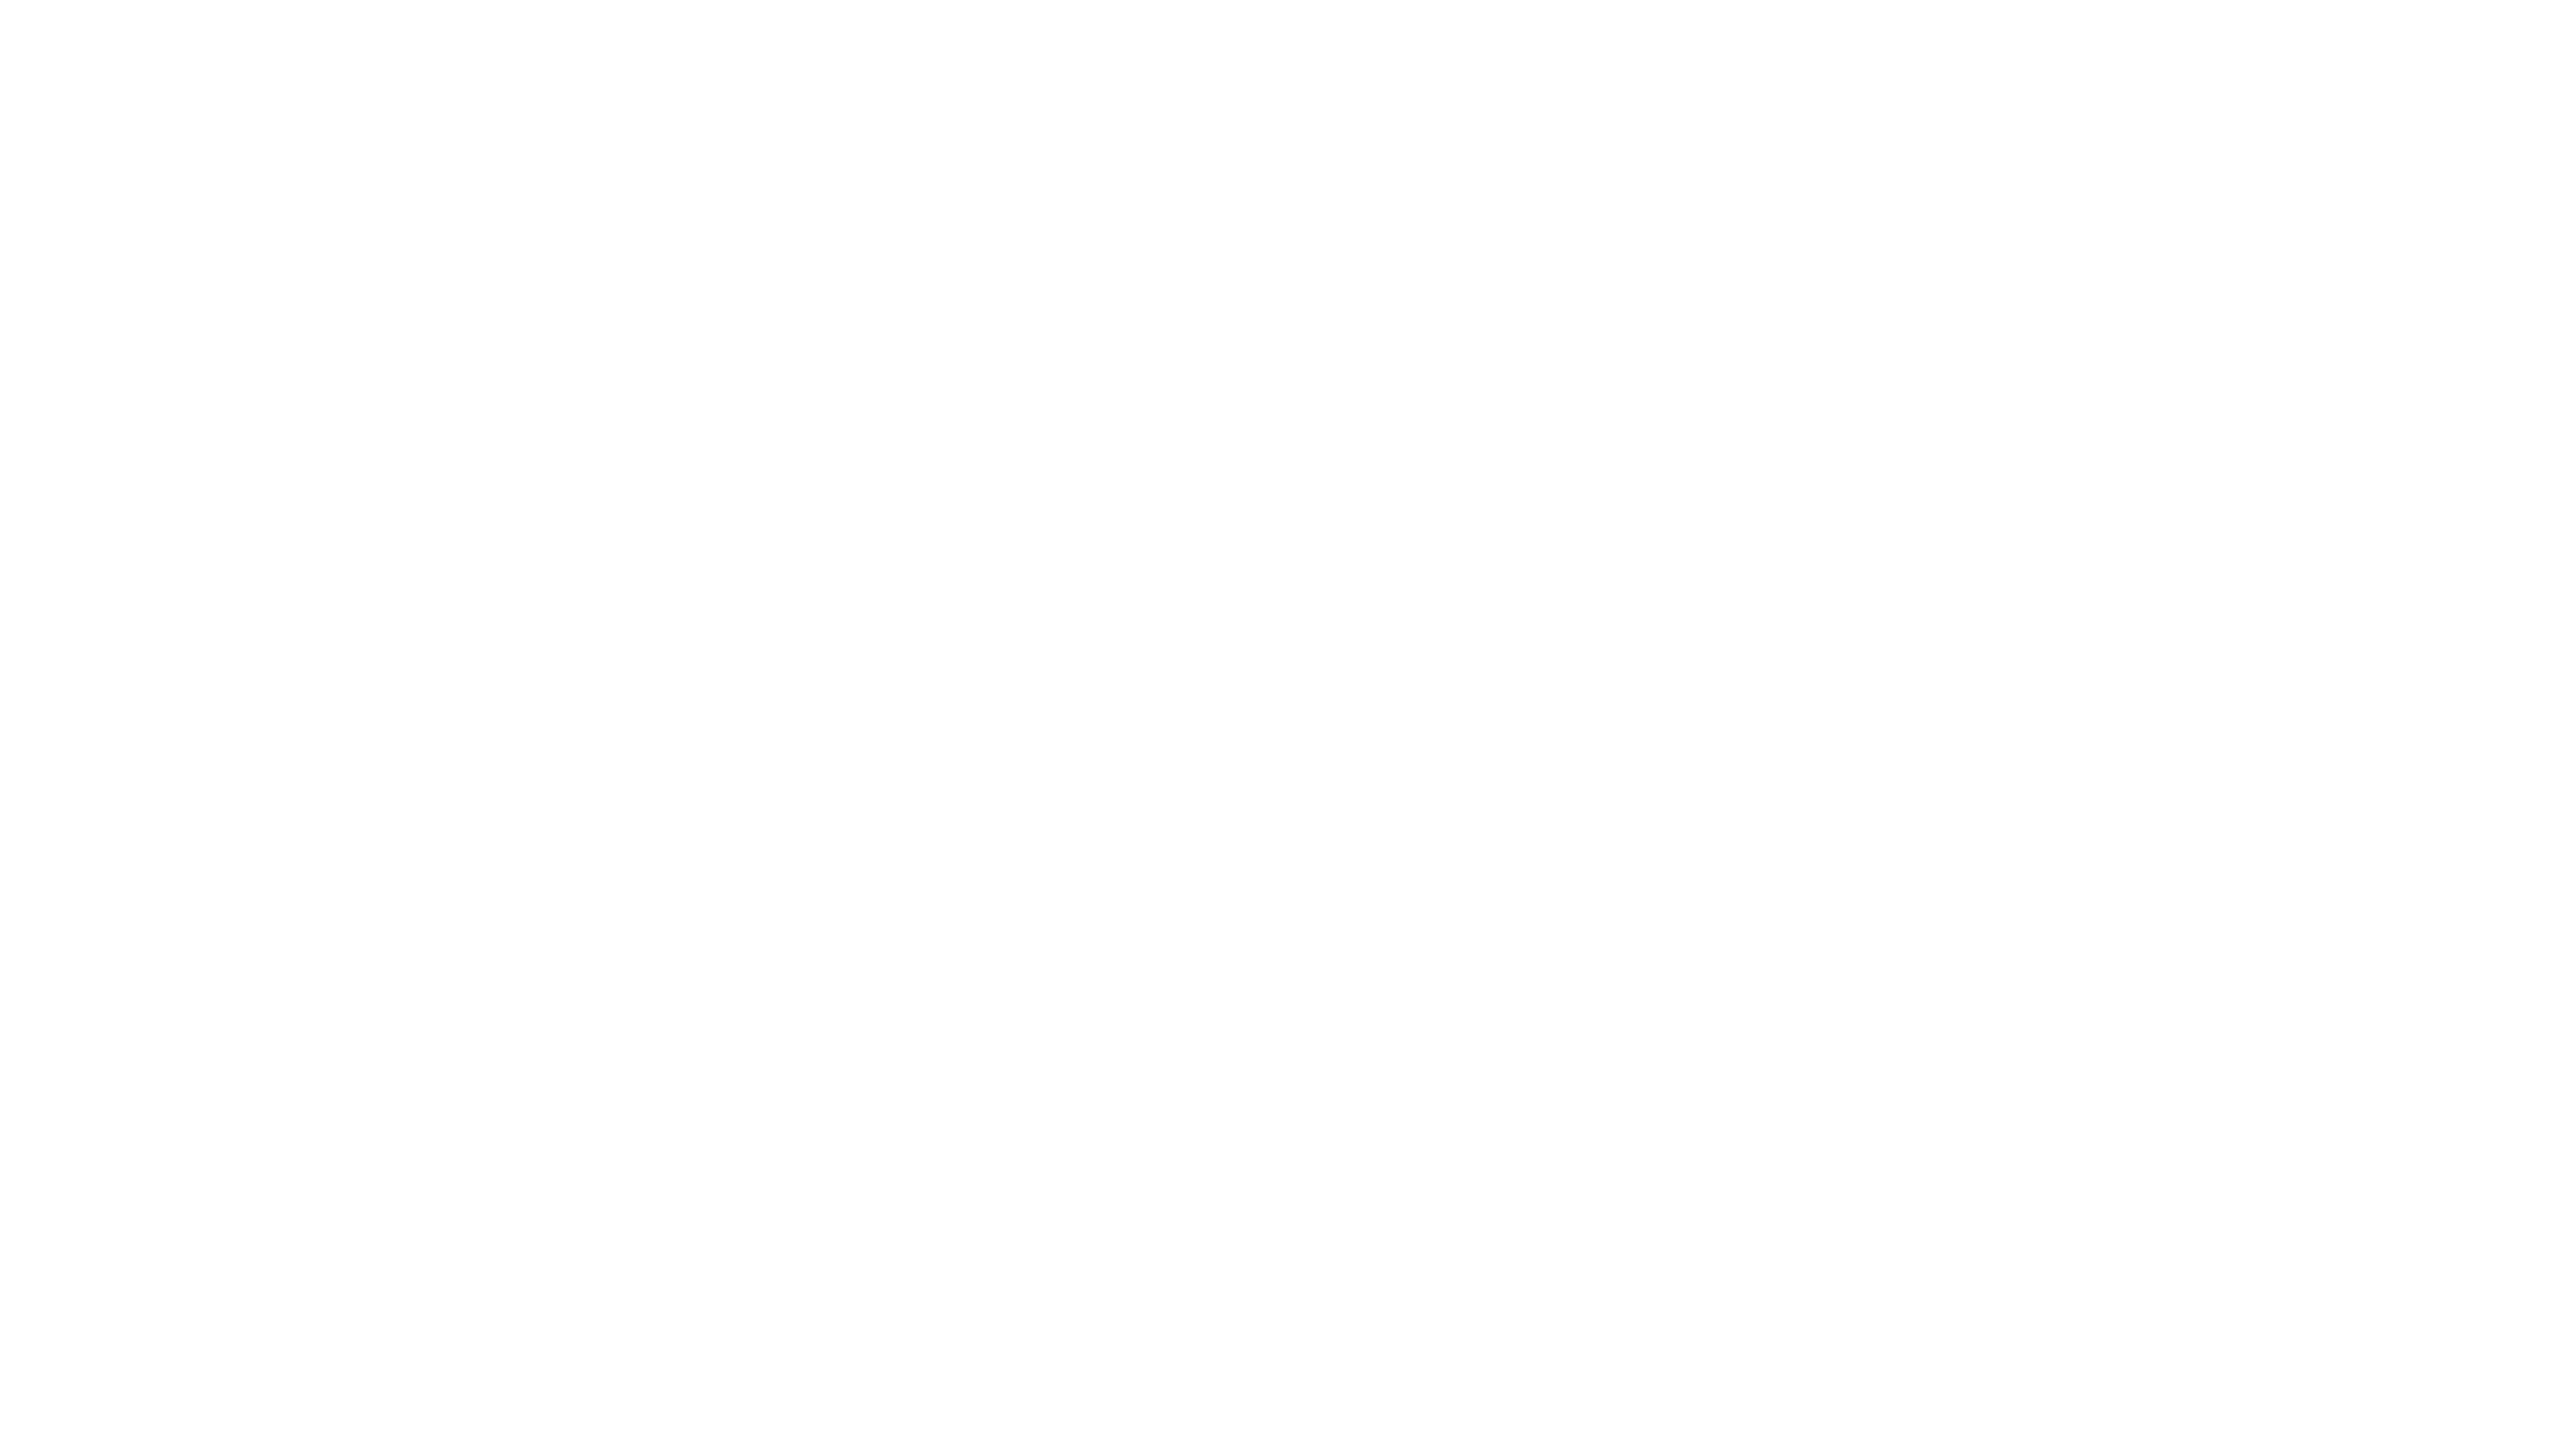 mercedes-benz business solutions